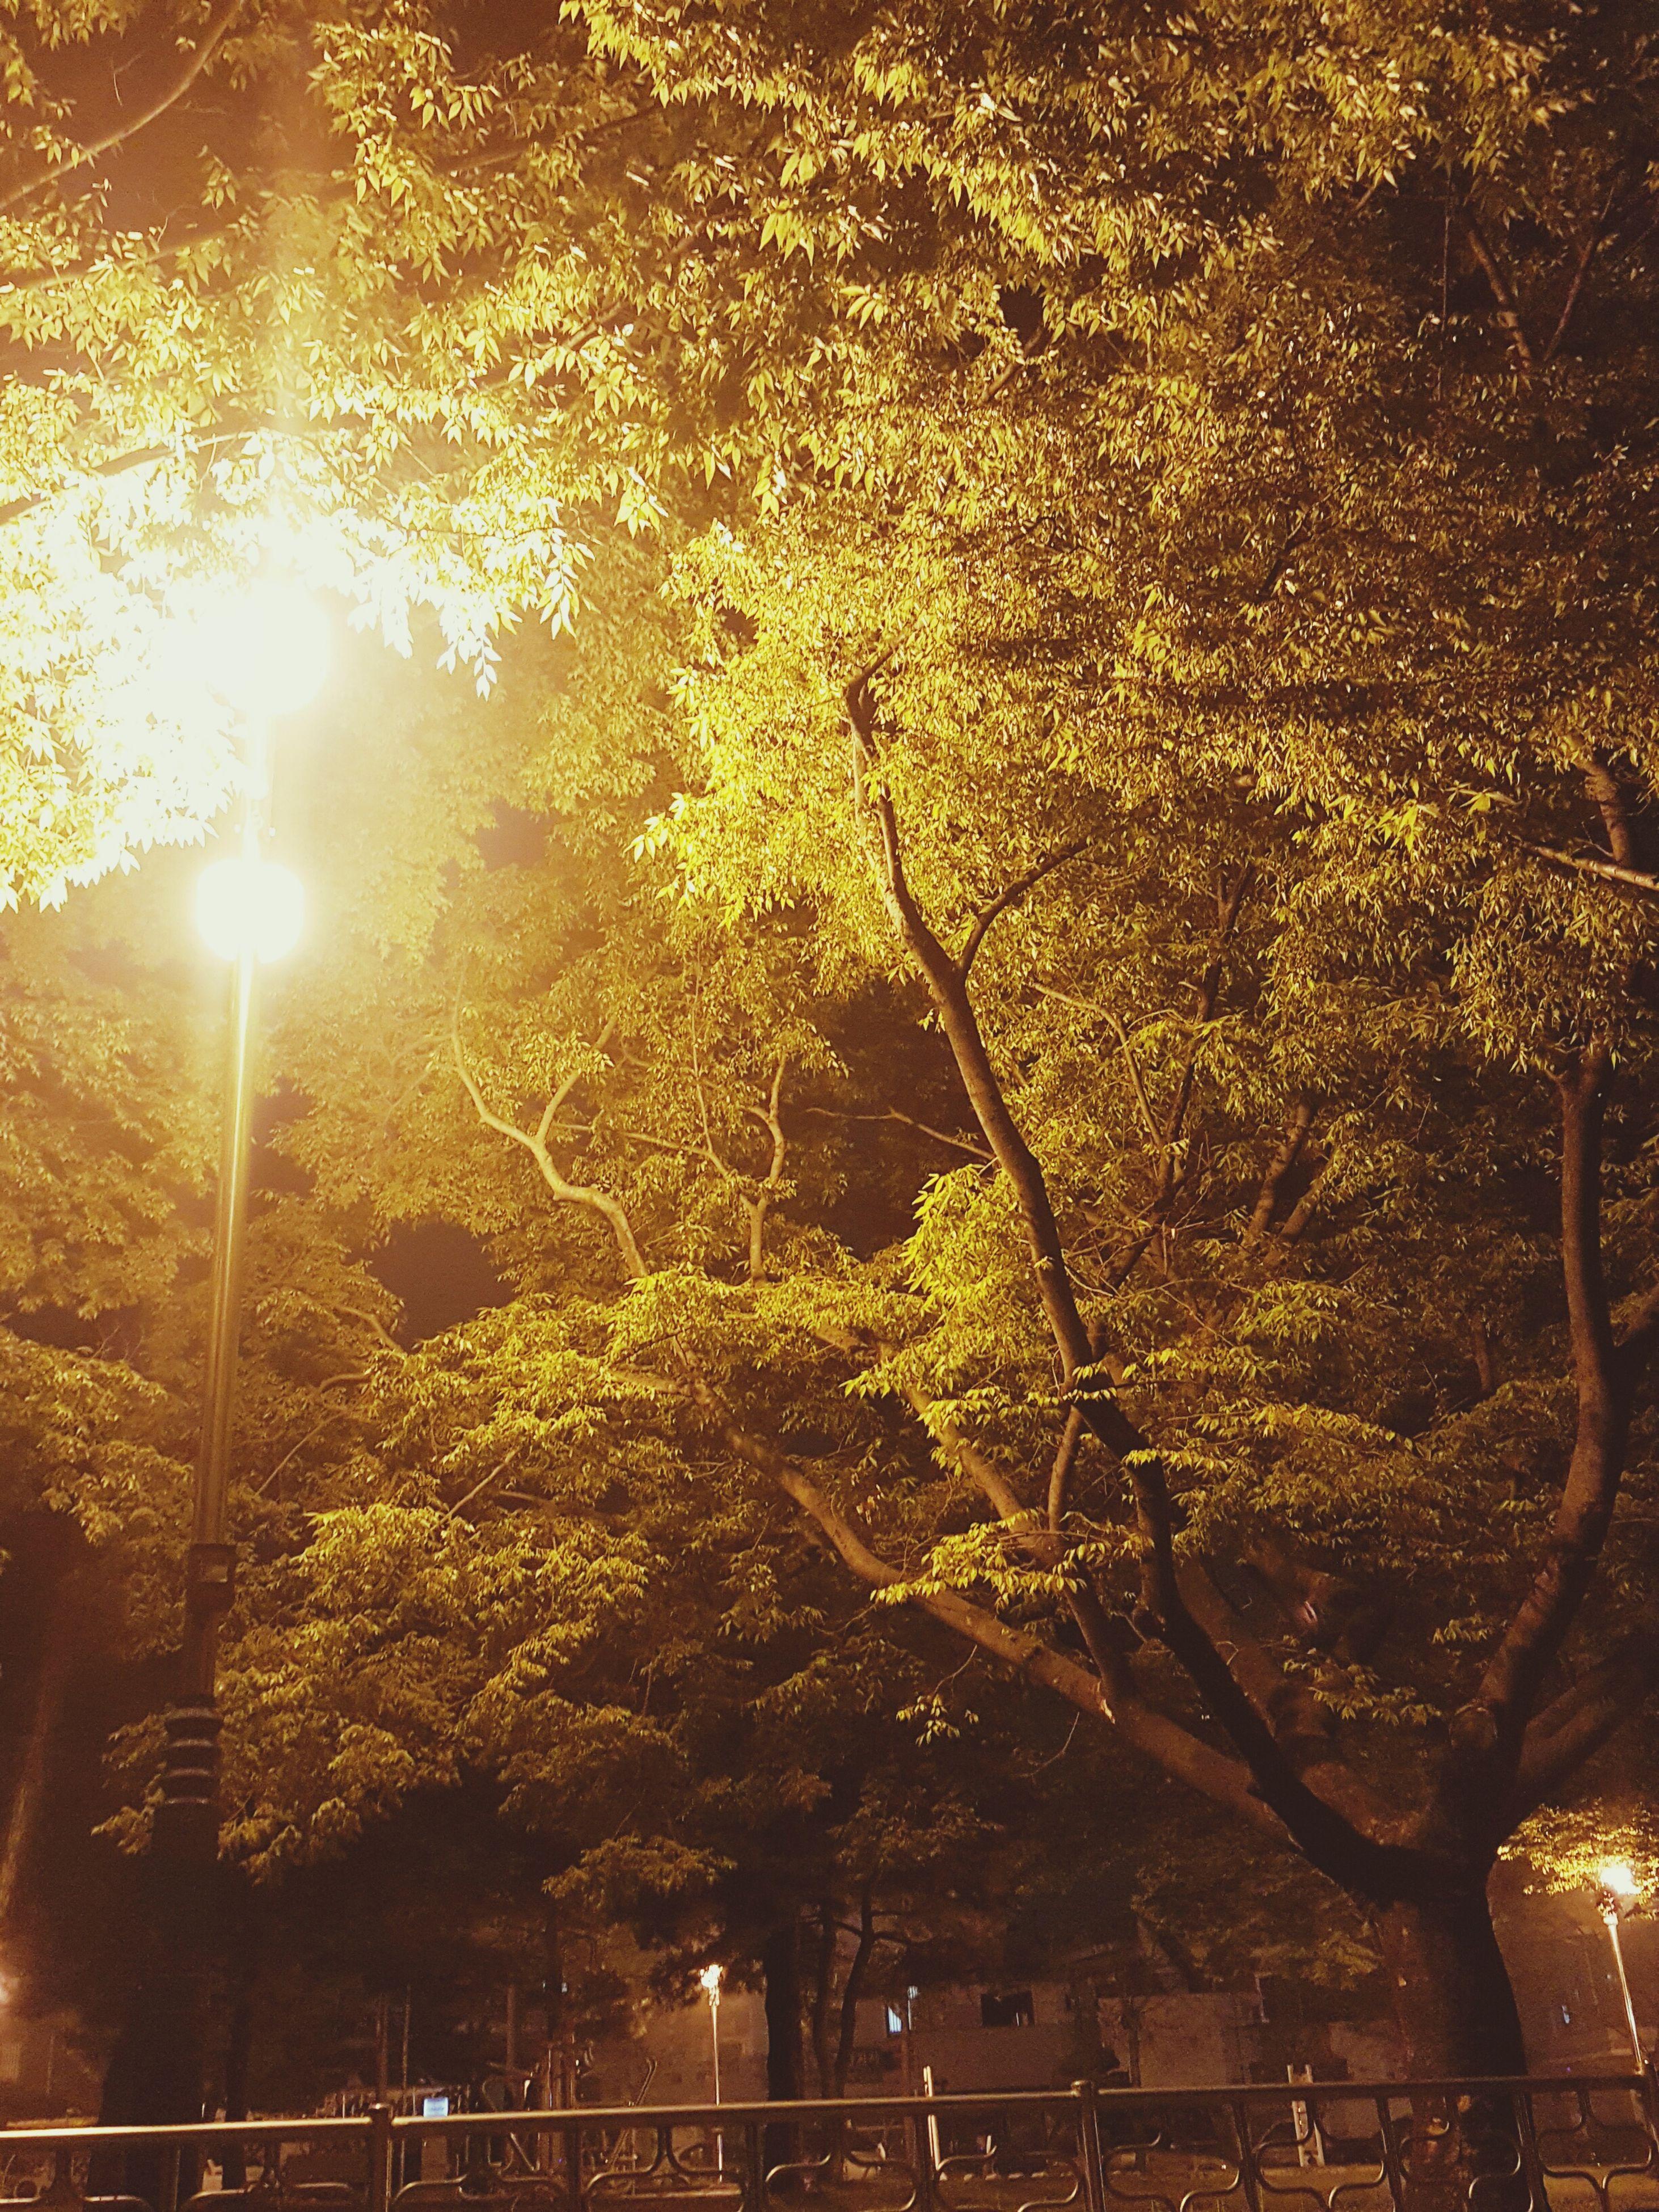 tree, illuminated, street light, branch, lighting equipment, growth, night, low angle view, nature, beauty in nature, tranquility, outdoors, sunlight, no people, lens flare, season, sun, sunbeam, light - natural phenomenon, glowing